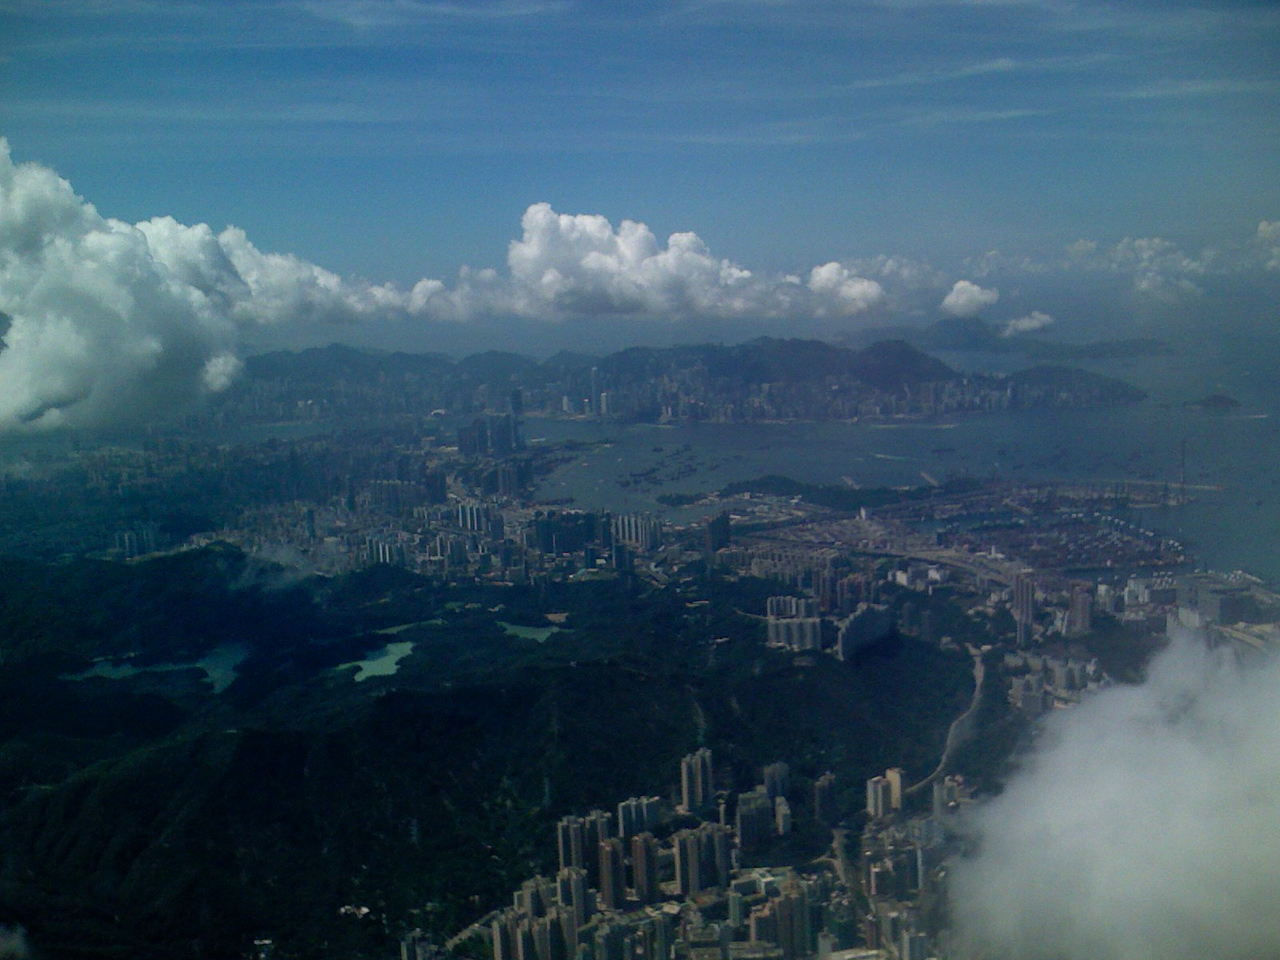 Taken during approach to Hong Kong International Airport after an overnight flight form Bangalore.